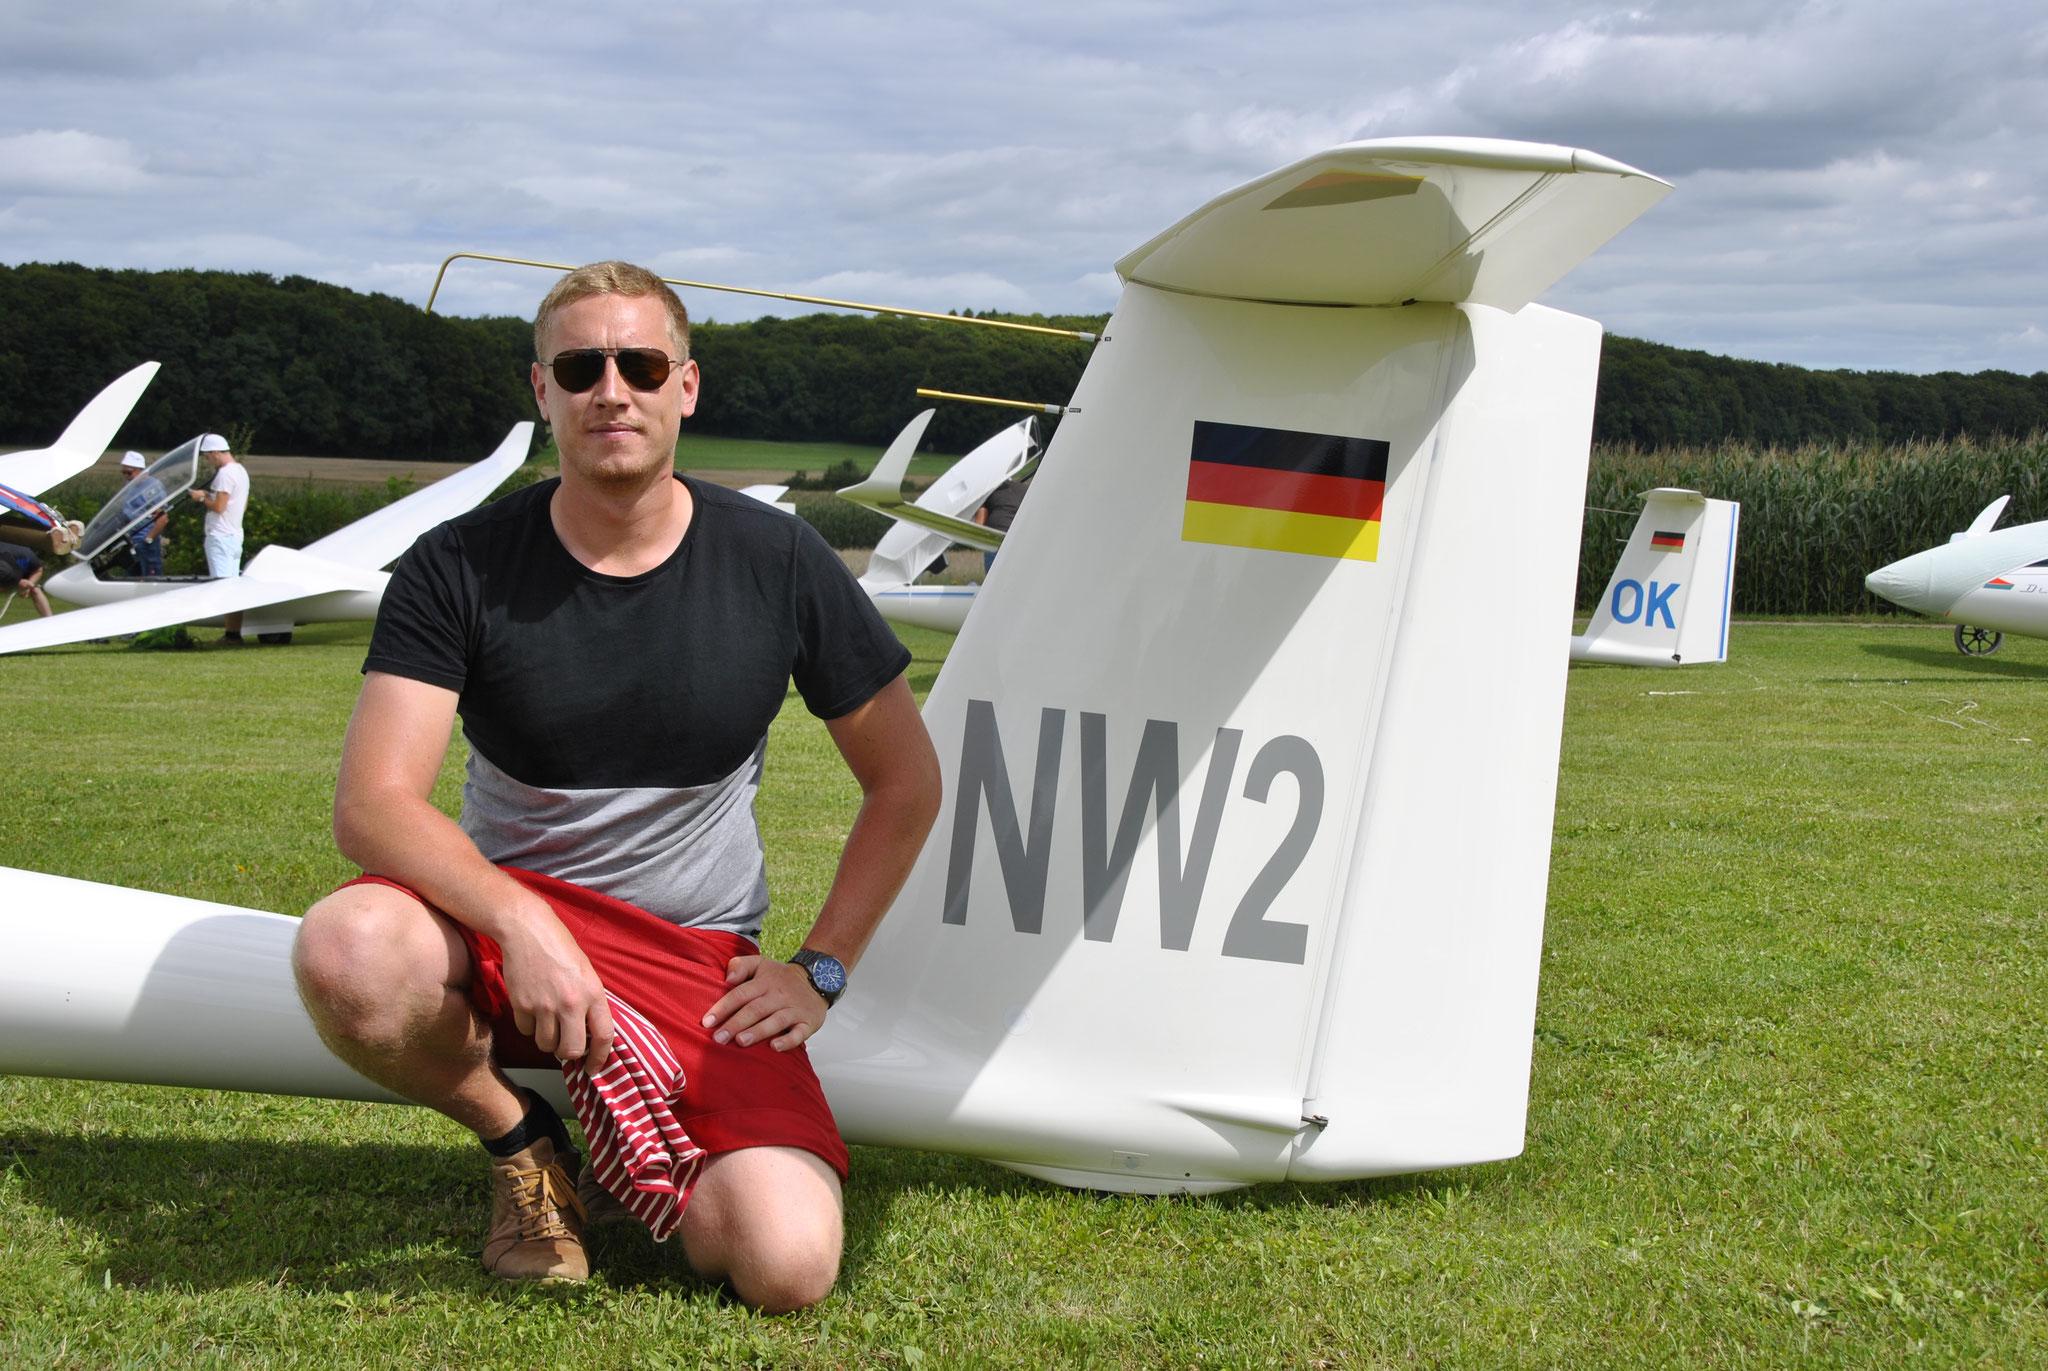 Pilot Michael